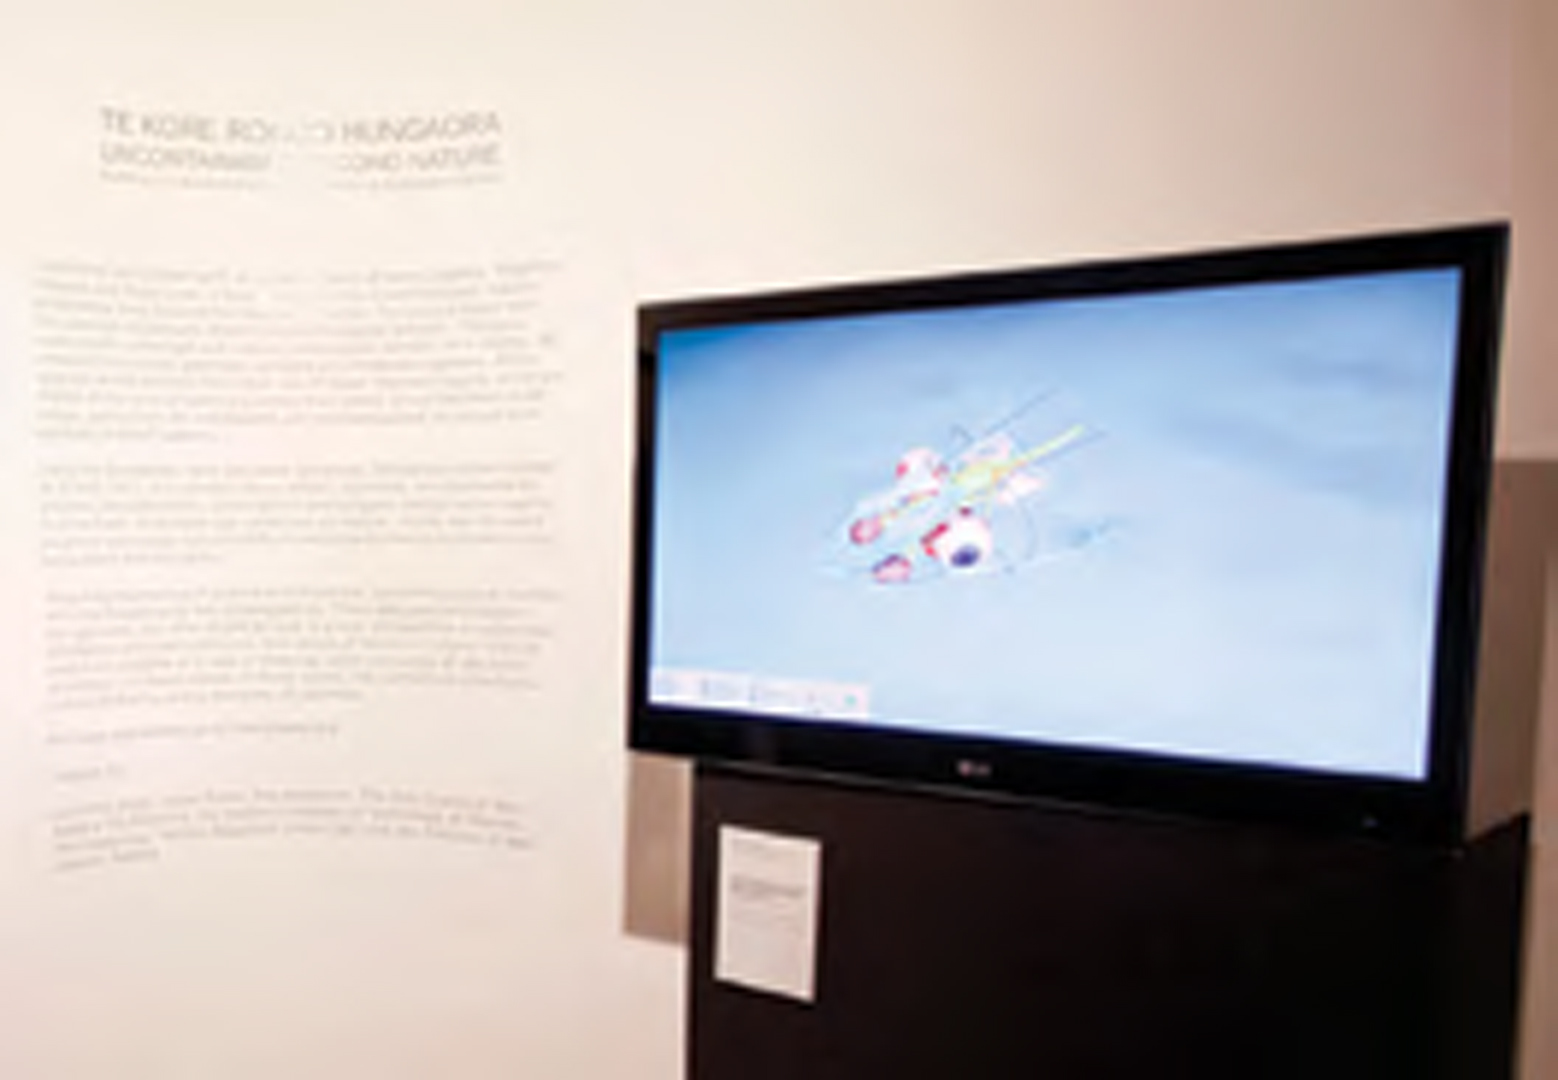 ©, Mike Paulin, Computational Visualization of the Electromagnetic Sensory World of Sharks